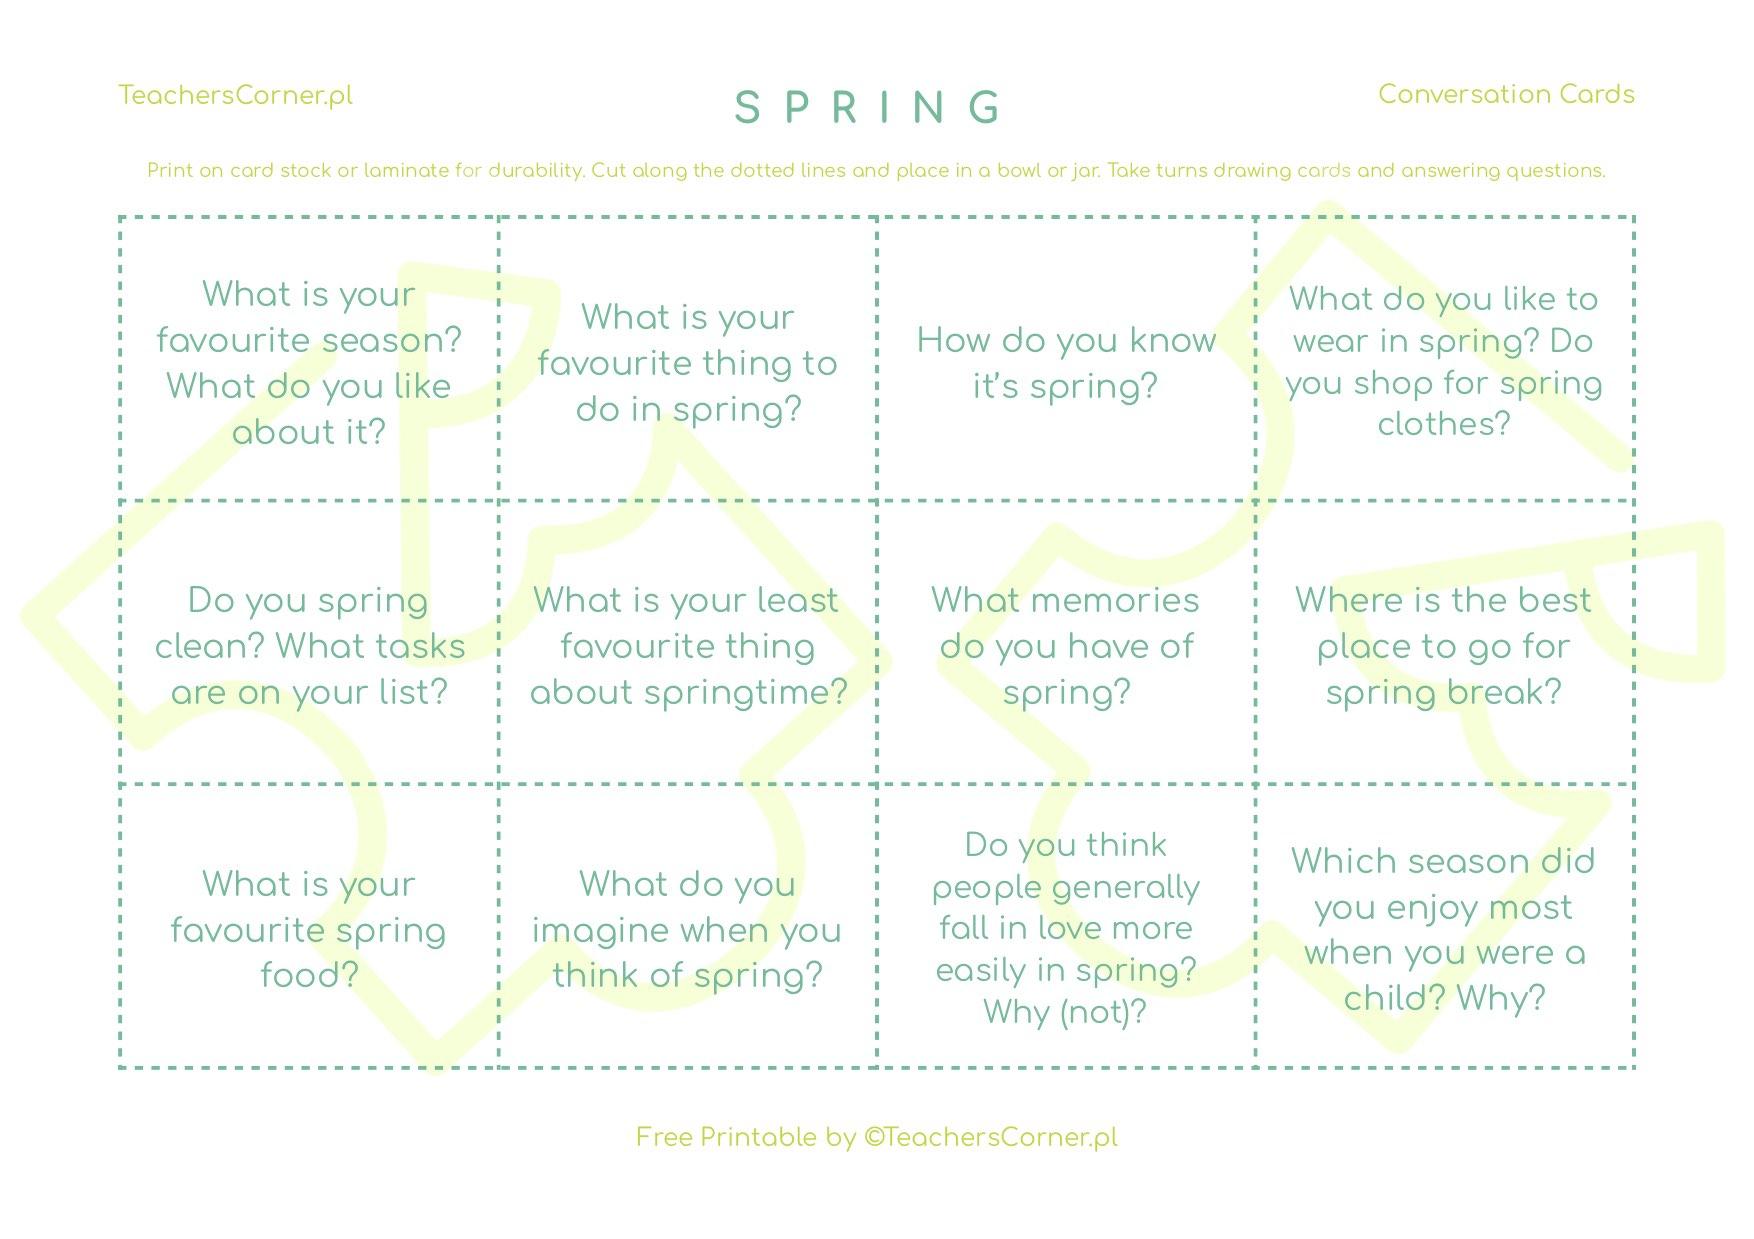 Spring conversation cards